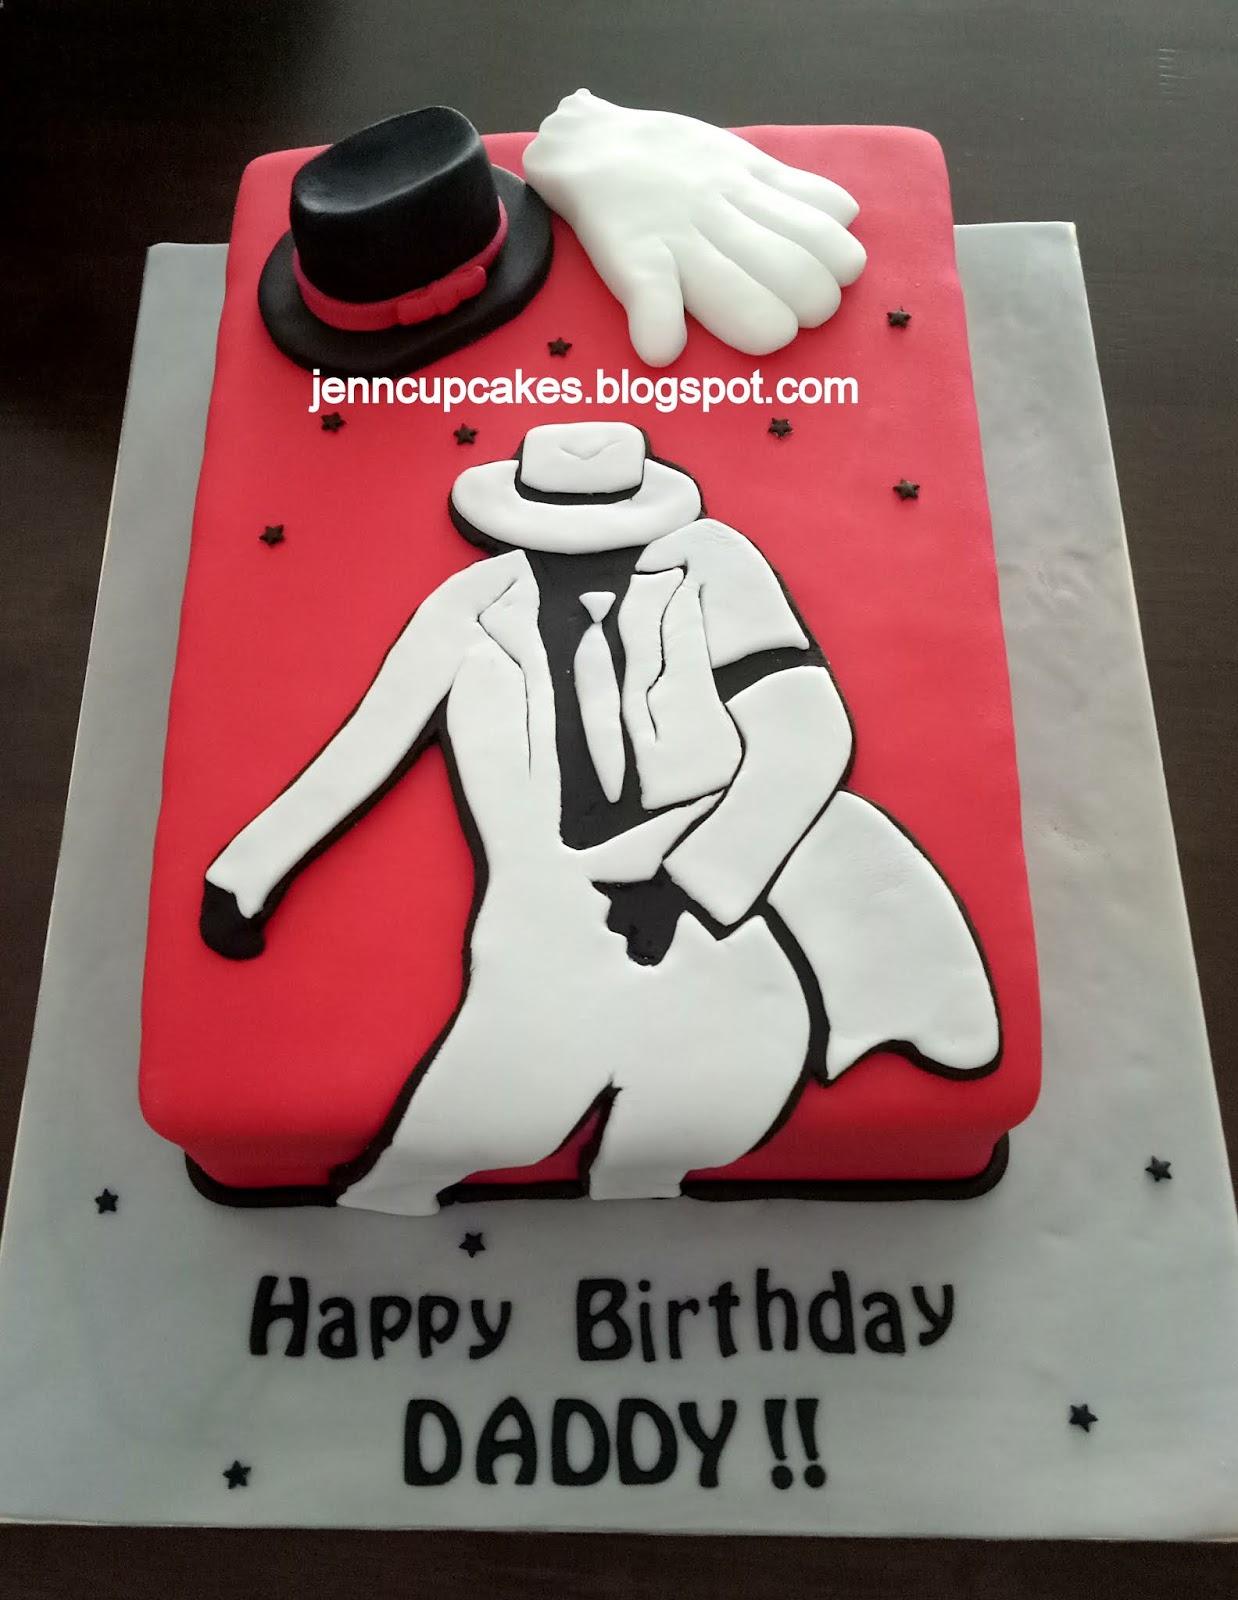 Outstanding Jenn Cupcakes Muffins Michael Jackson Theme Cake Funny Birthday Cards Online Alyptdamsfinfo